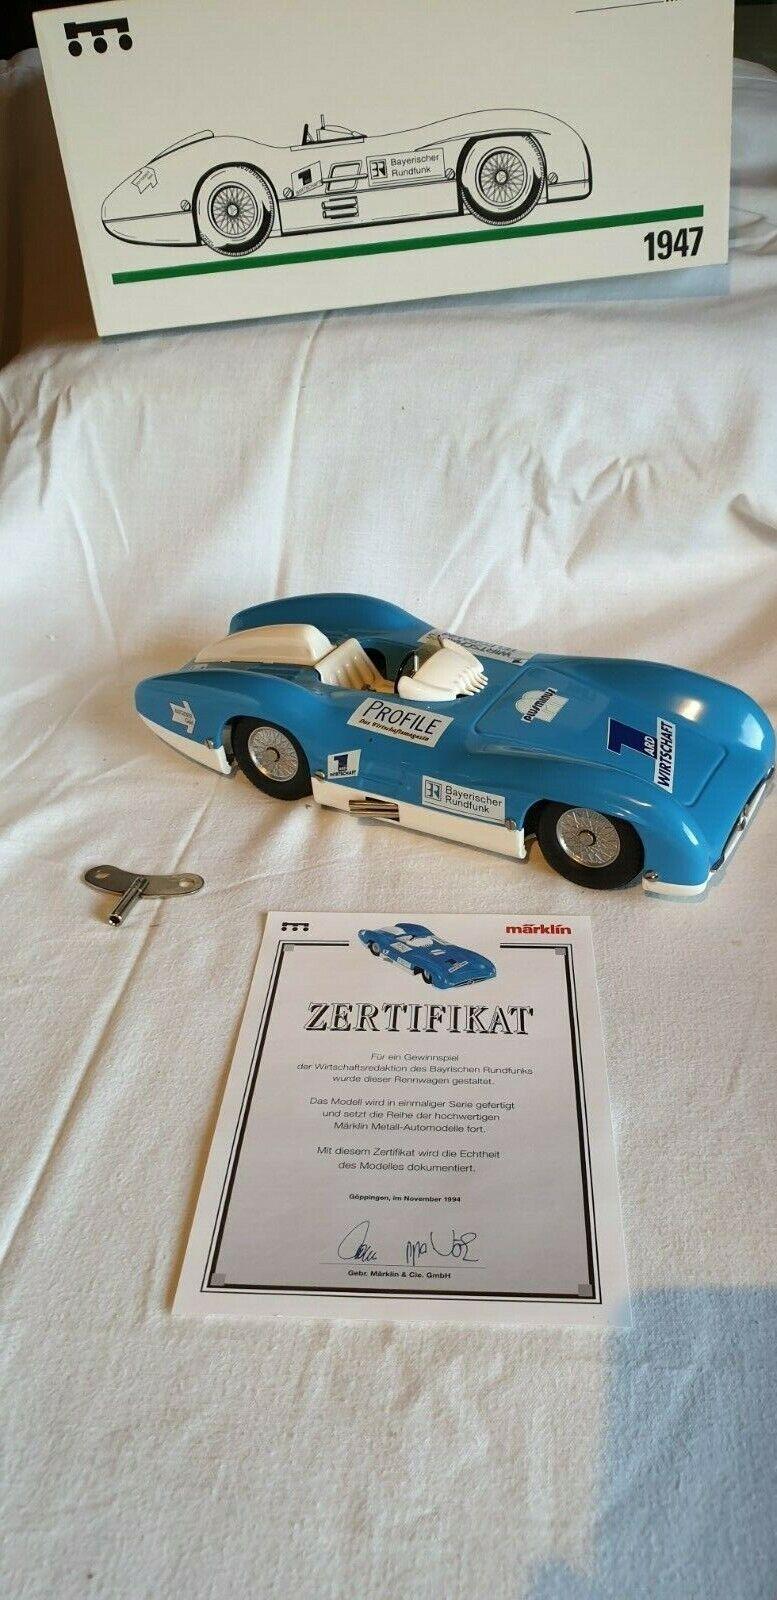 Märklin métal Voiture de course bavaroise RADIODIFFUSION Nº 1947 DE 1994 NEUF, neuf dans sa boîte